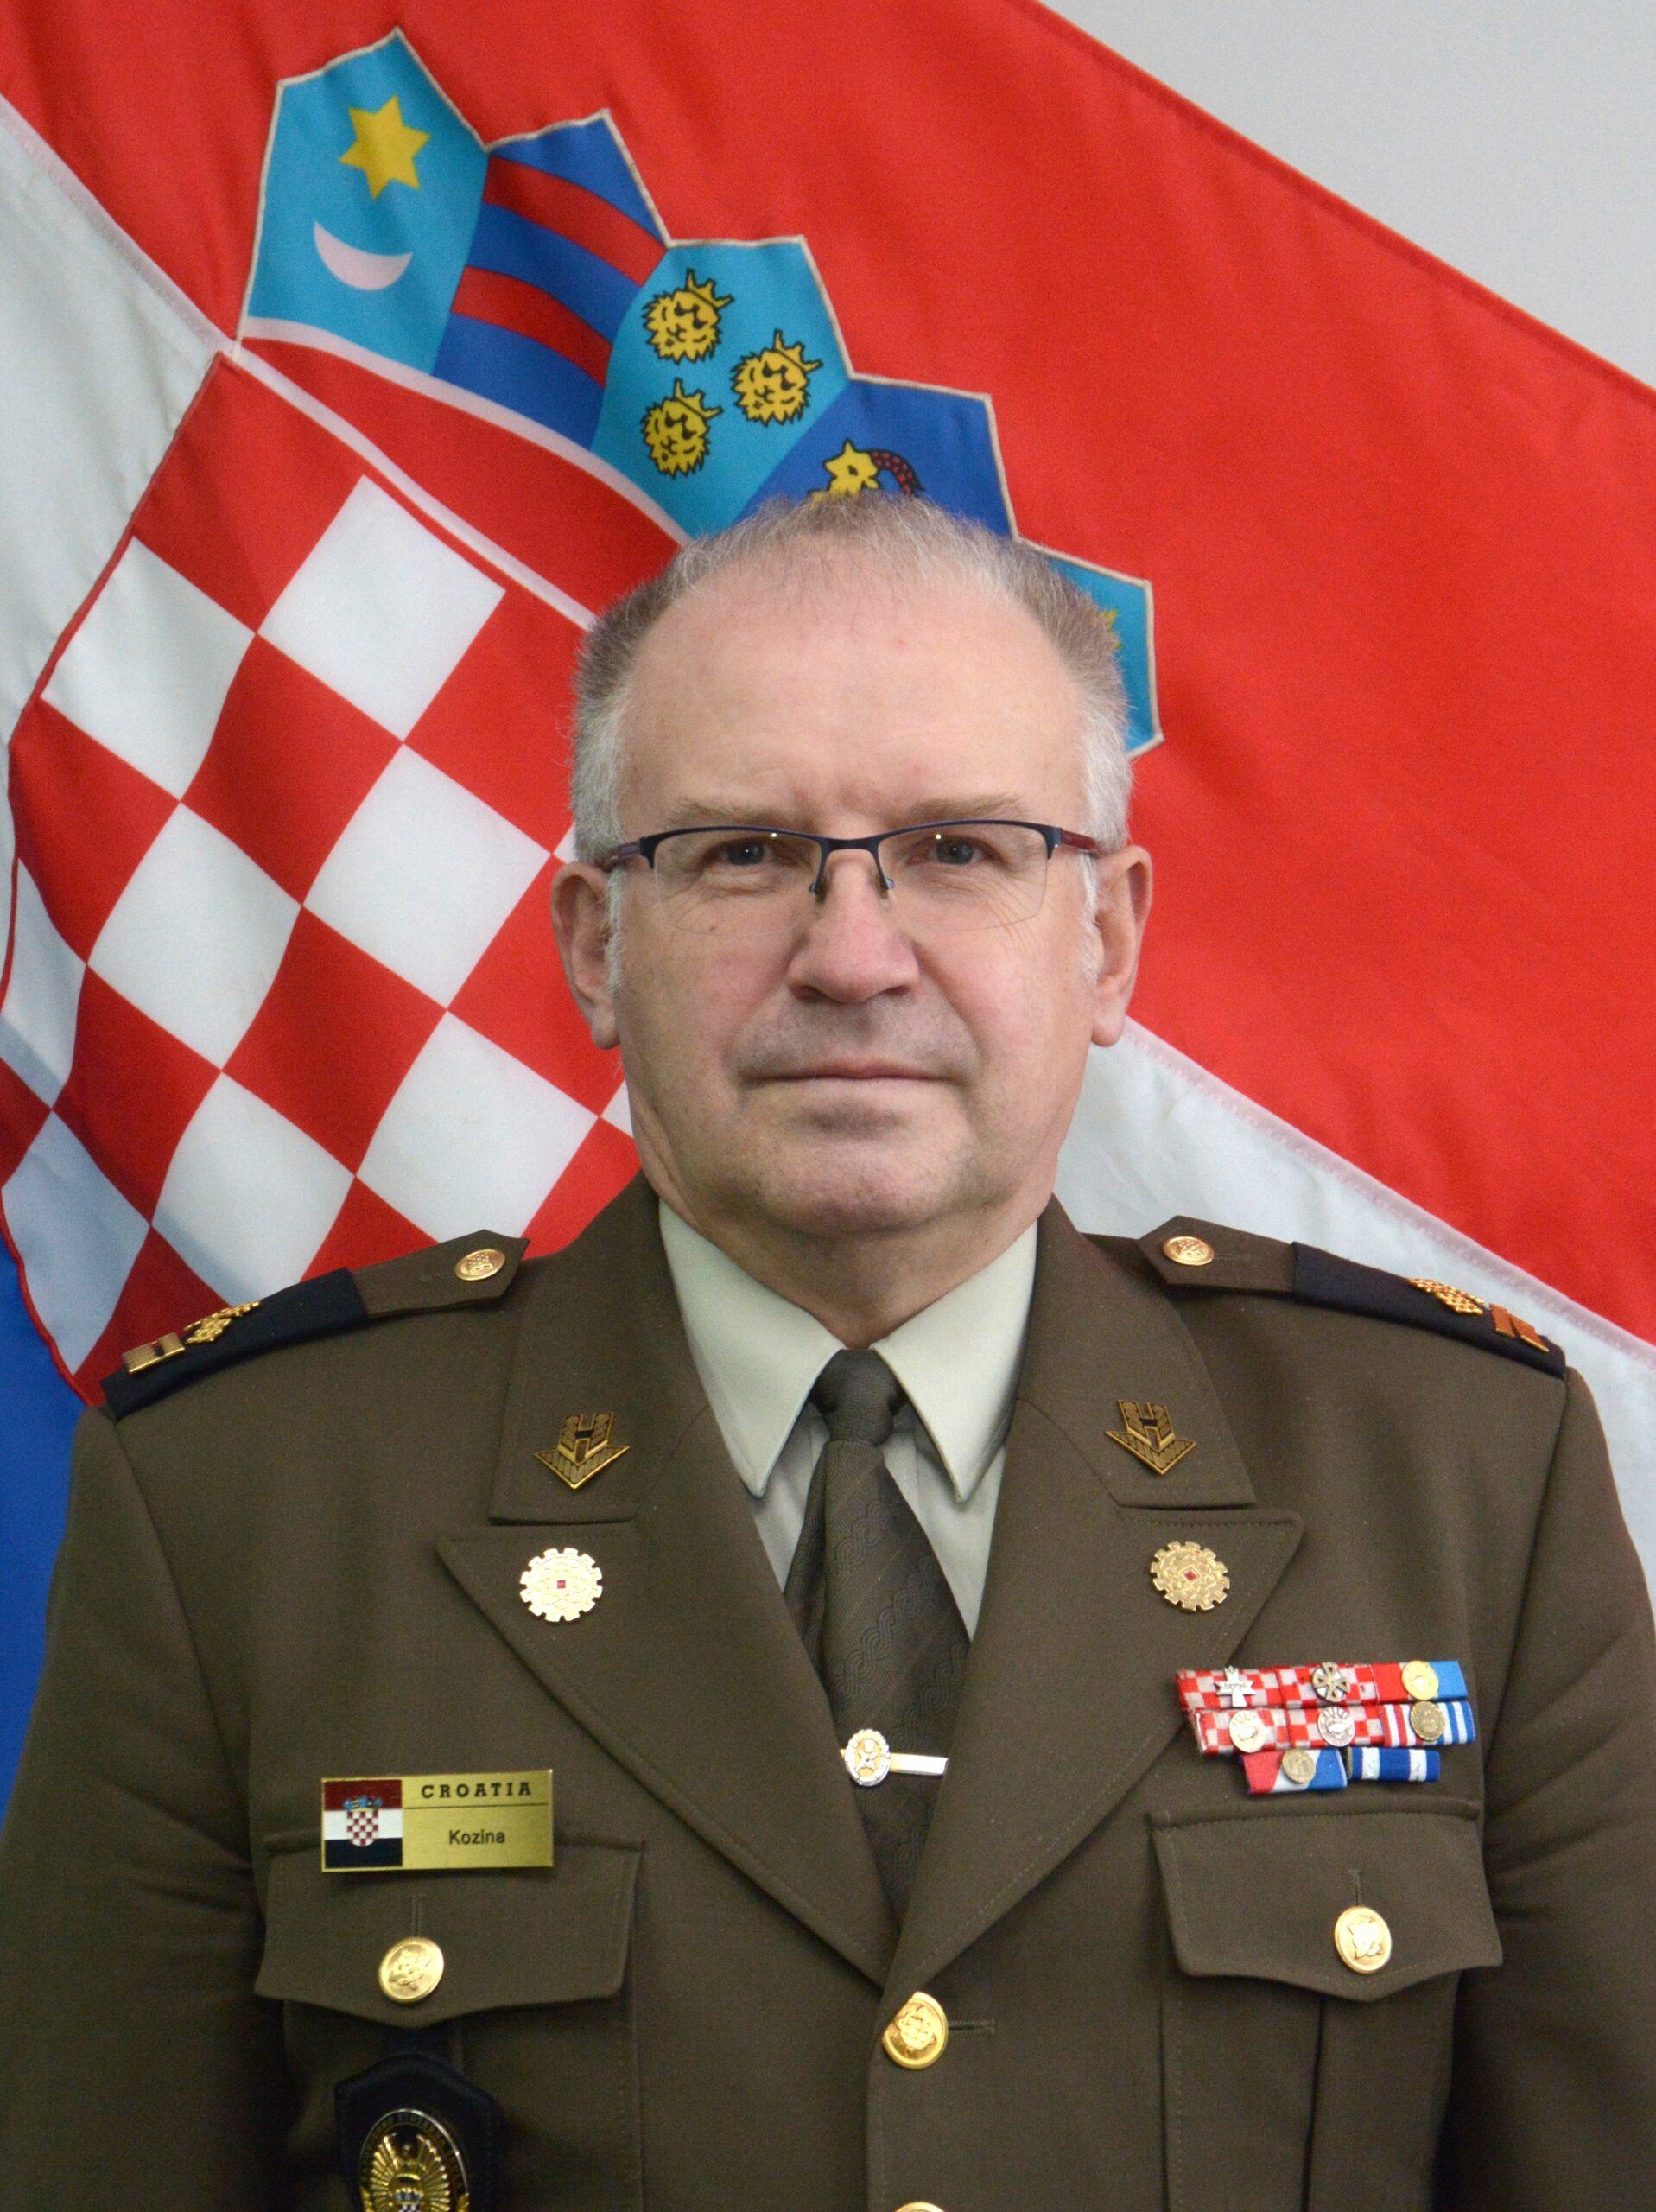 Brigadir dr. sc. Andrija Kozina